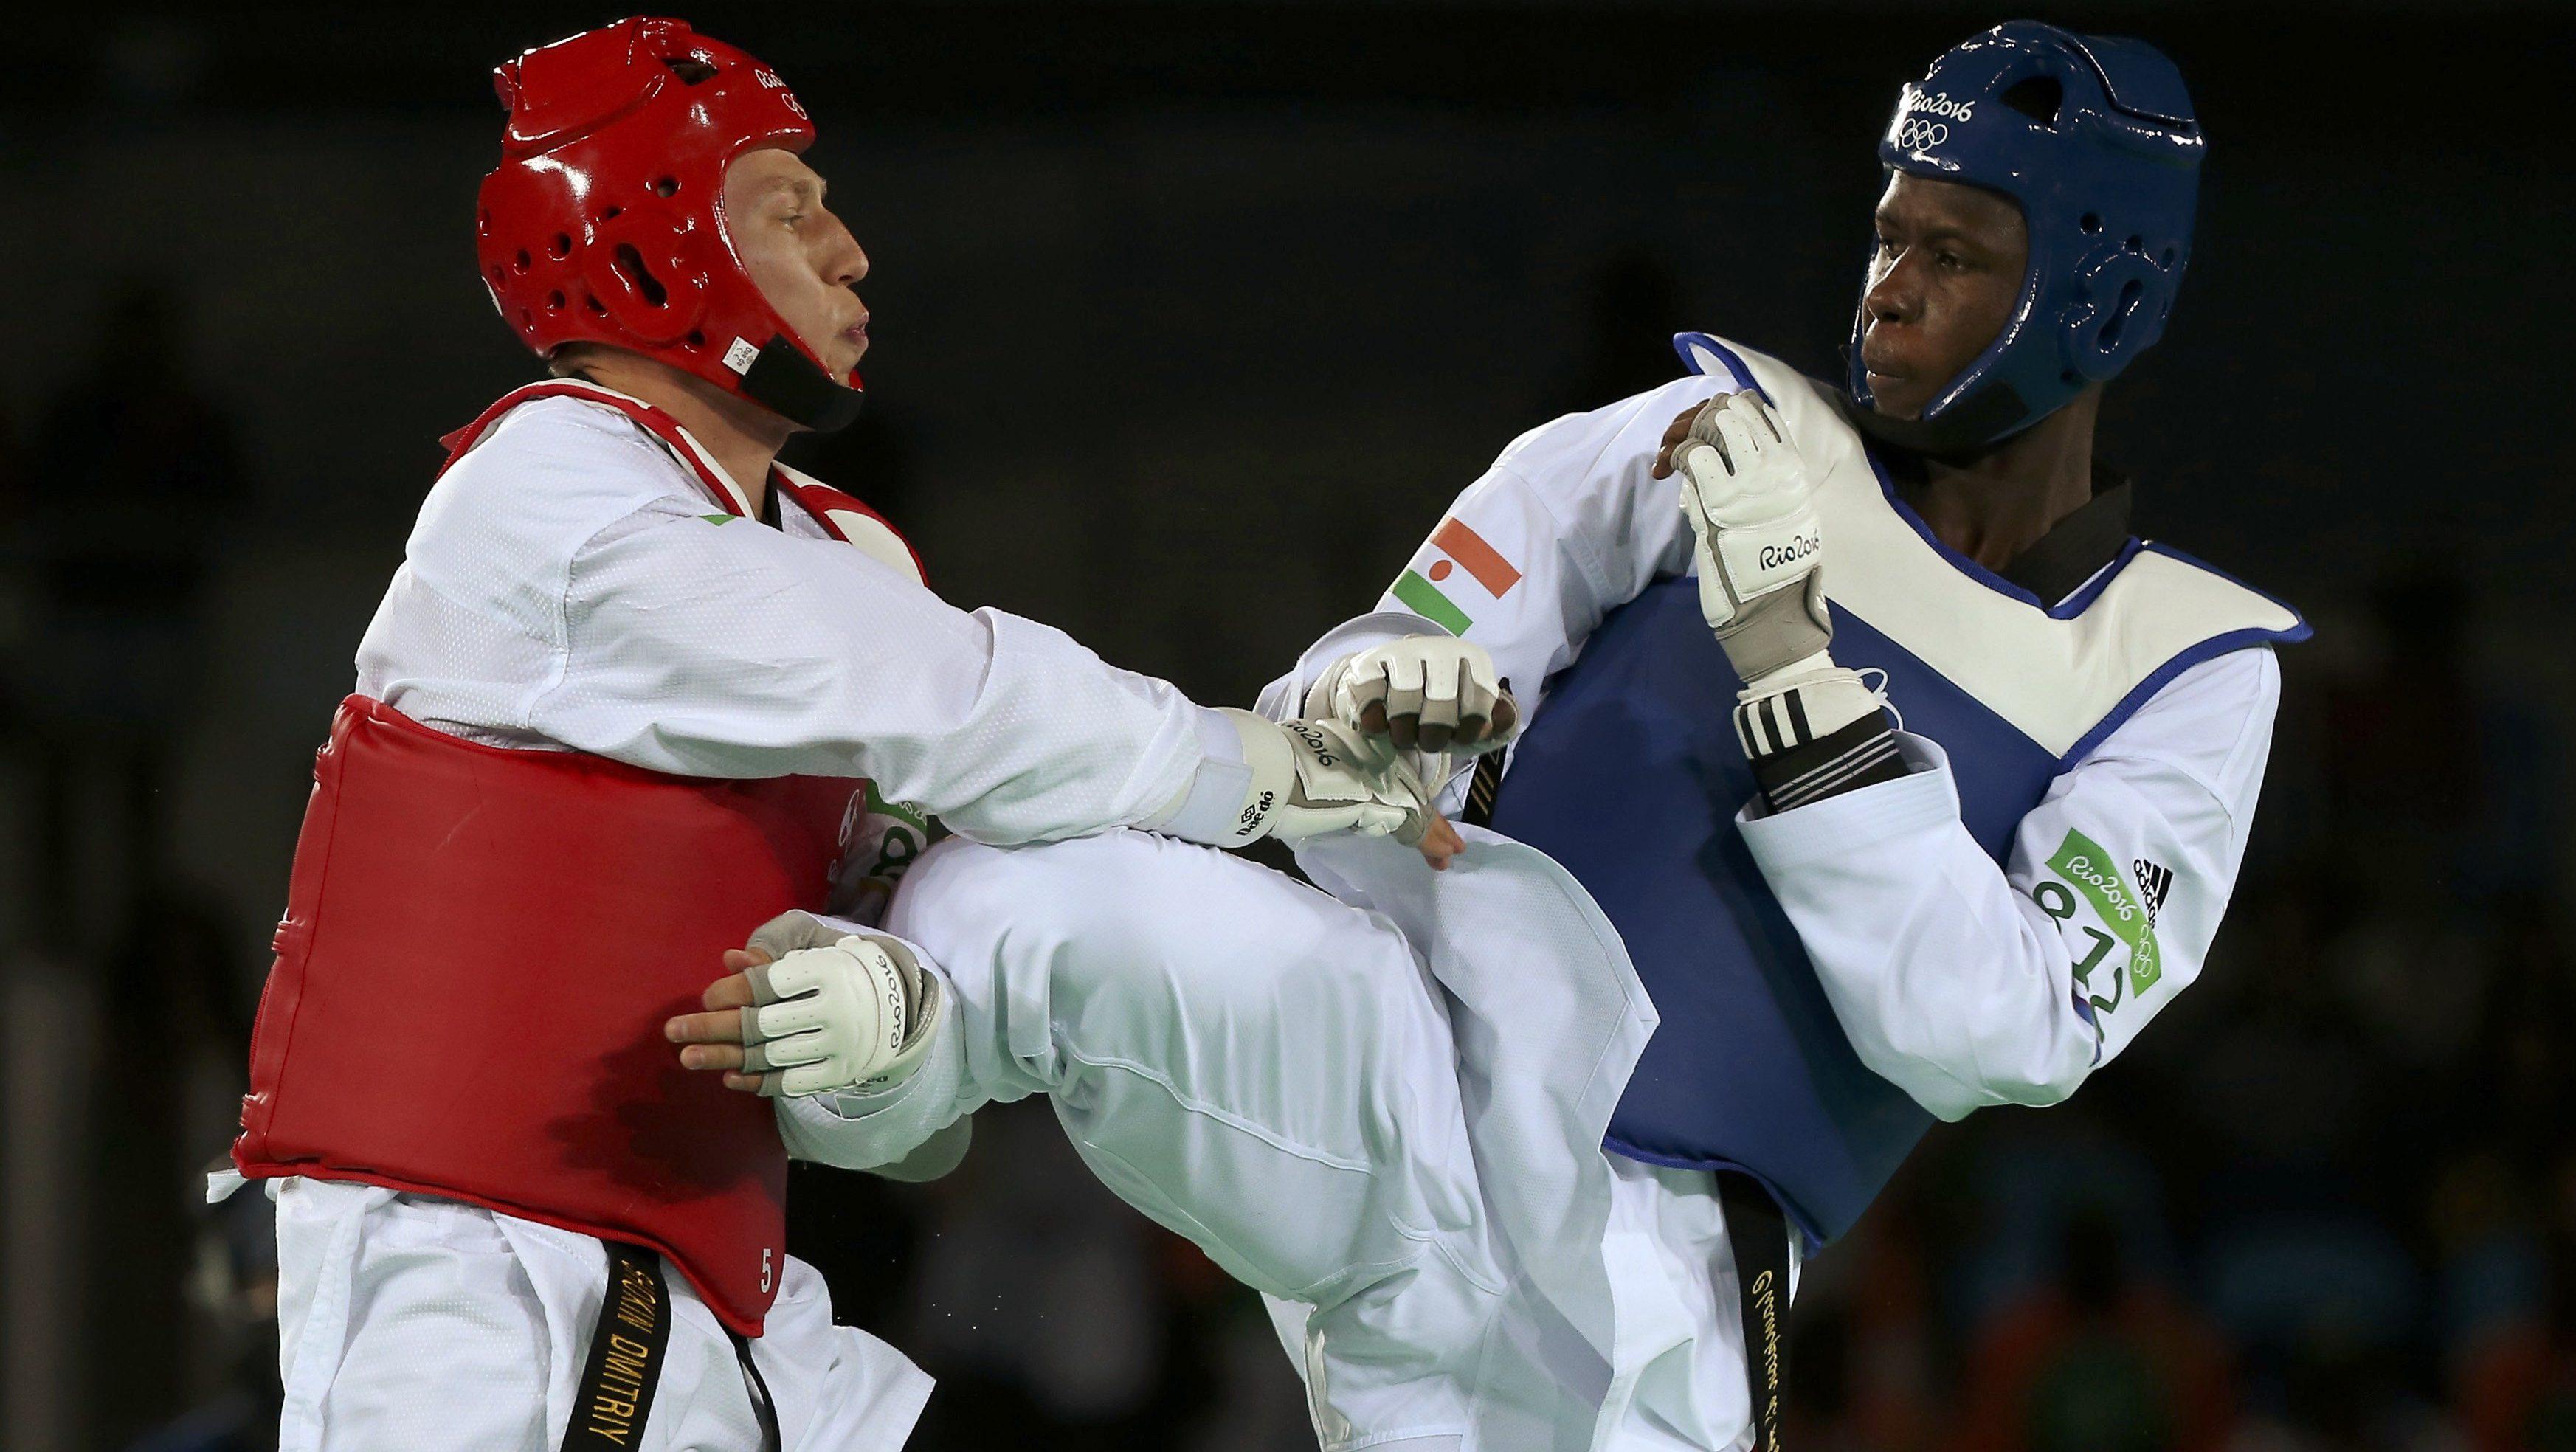 2016 Rio Olympics - Taekwondo - Semifinal - Men's +80kg Semifinals - Carioca Arena 3 - Rio de Janeiro, Brazil - 20/08/2016. Dmitriy Shokin (UZB) of Uzbekistan competes with Issoufou Alfaga Abdoulrazak (NIG) of Niger. REUTERS/Issei Kato FOR EDITORIAL USE ONLY. NOT FOR SALE FOR MARKETING OR ADVERTISING CAMPAIGNS. - RTX2MC9P